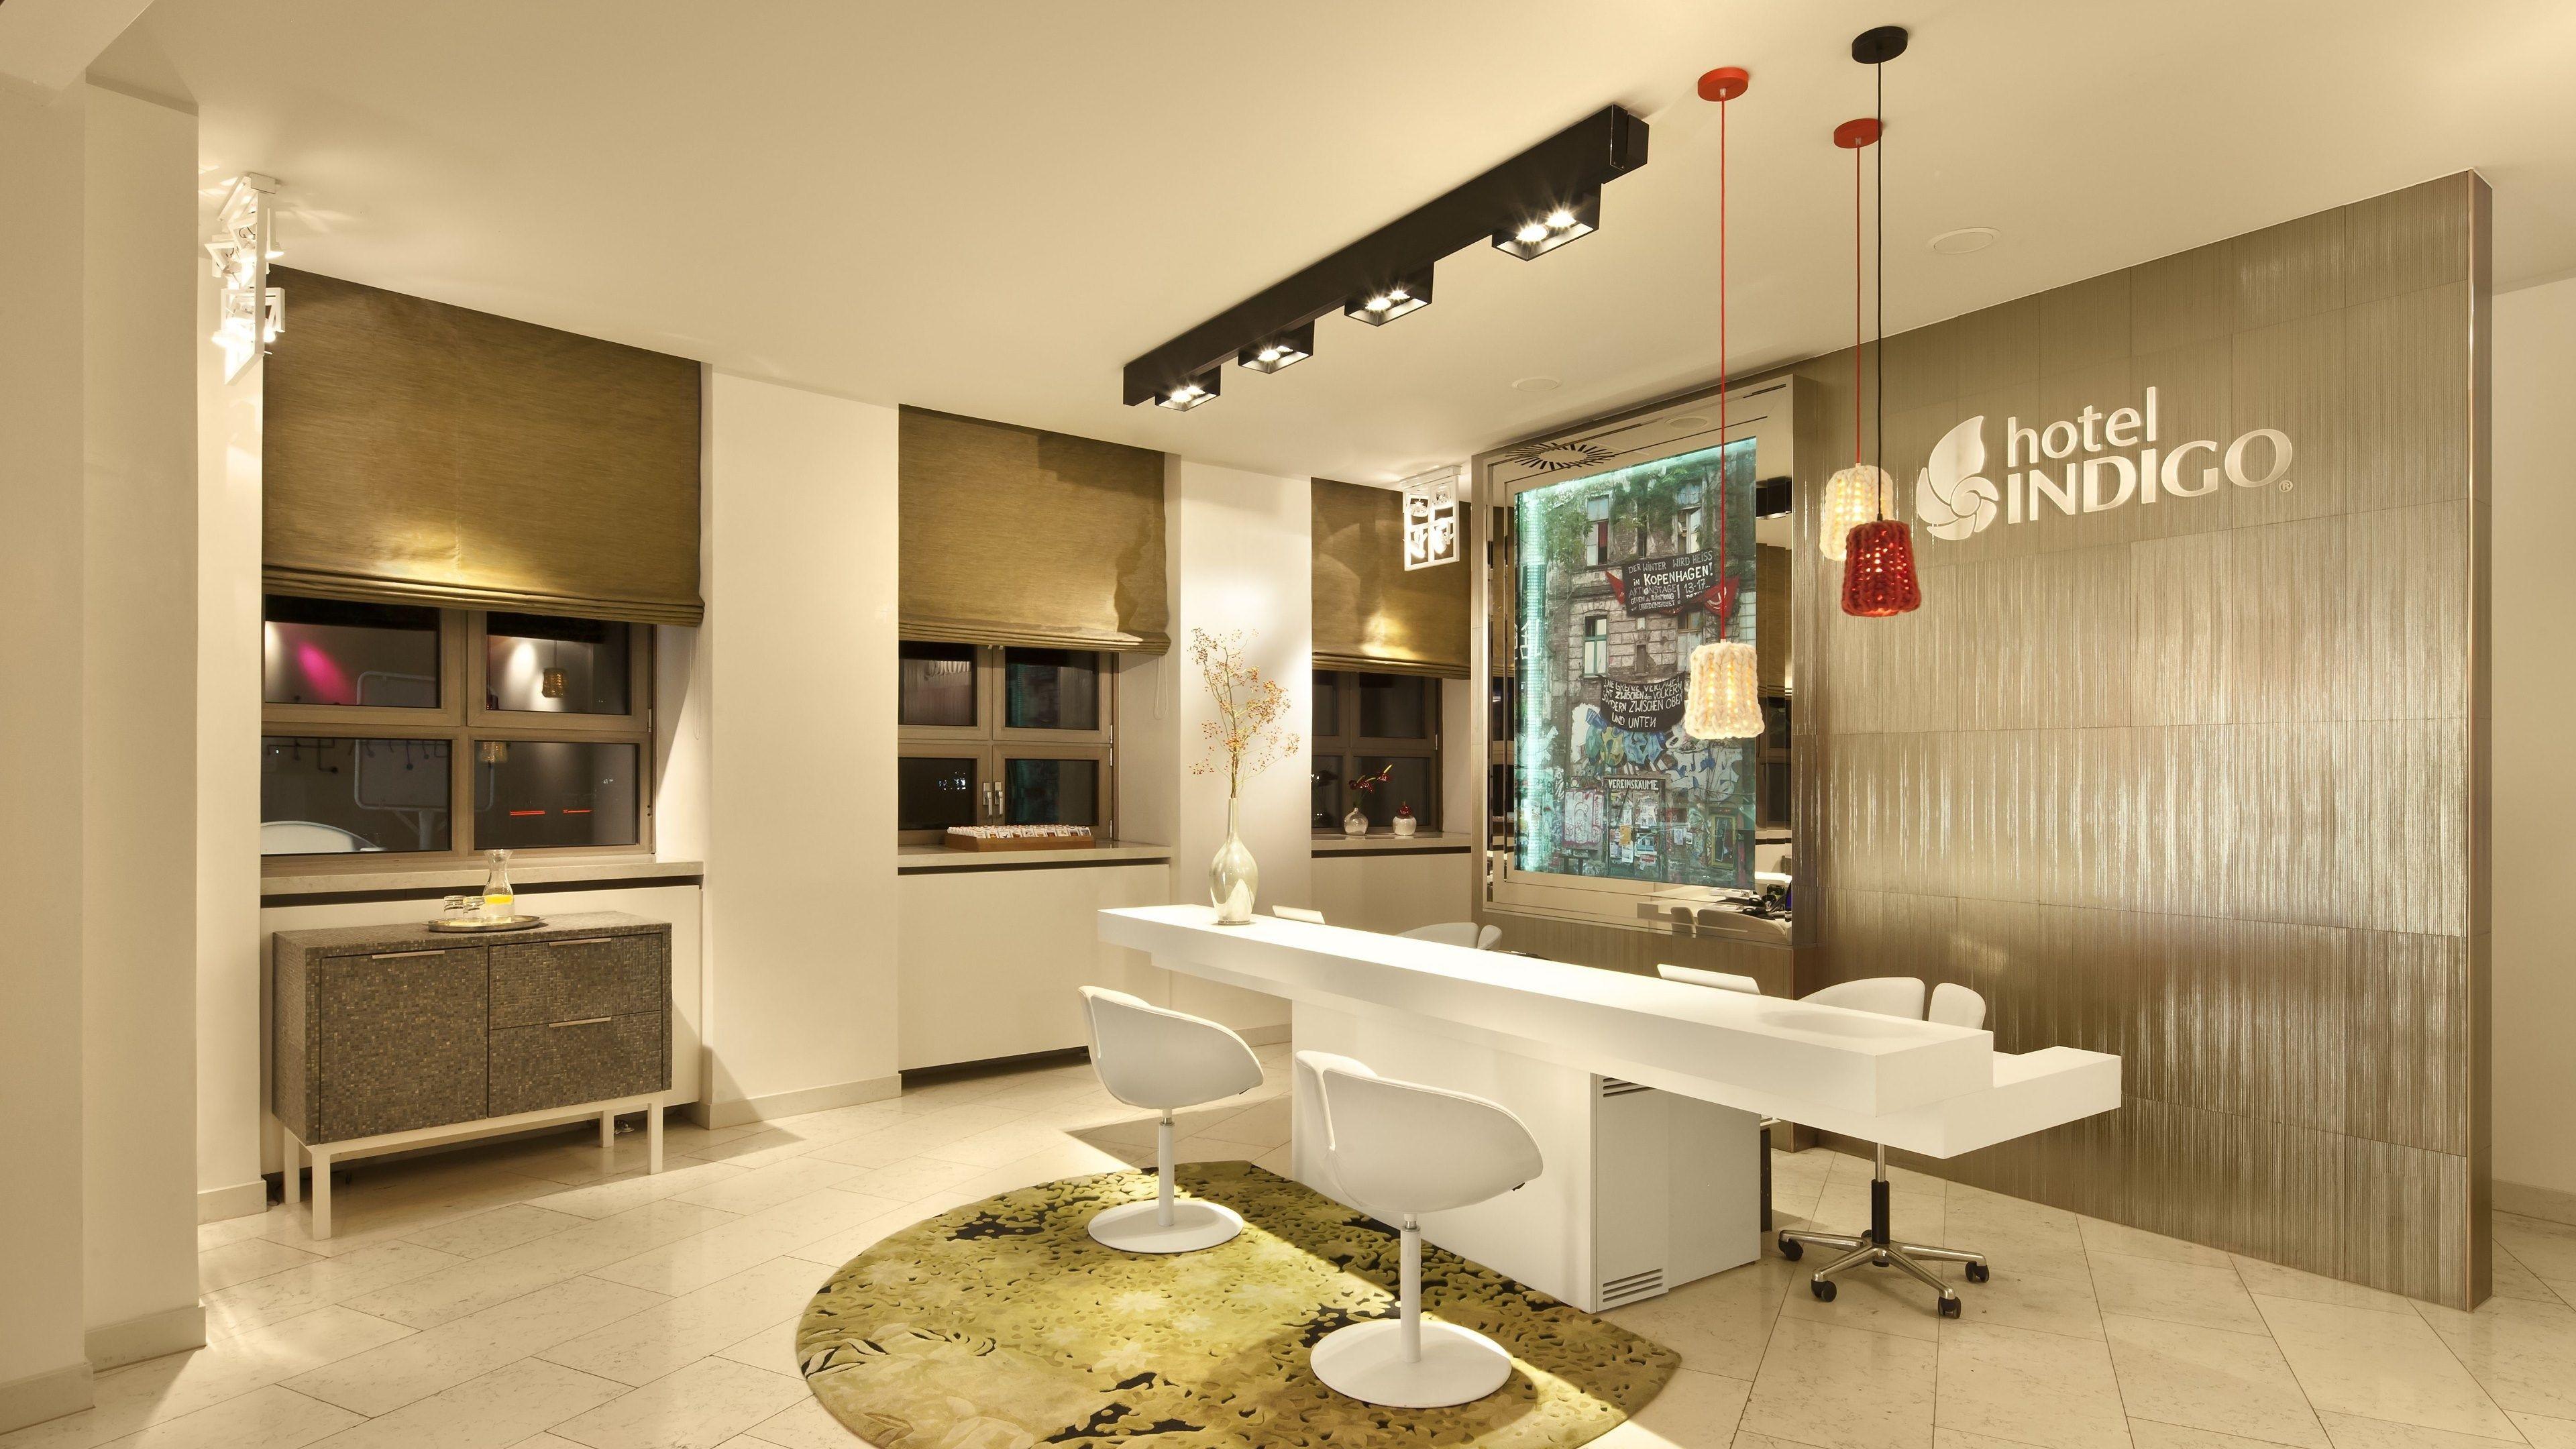 4k hotel indigo hd wallpaper (3840x2160) | Hd wallpaper and Wallpaper